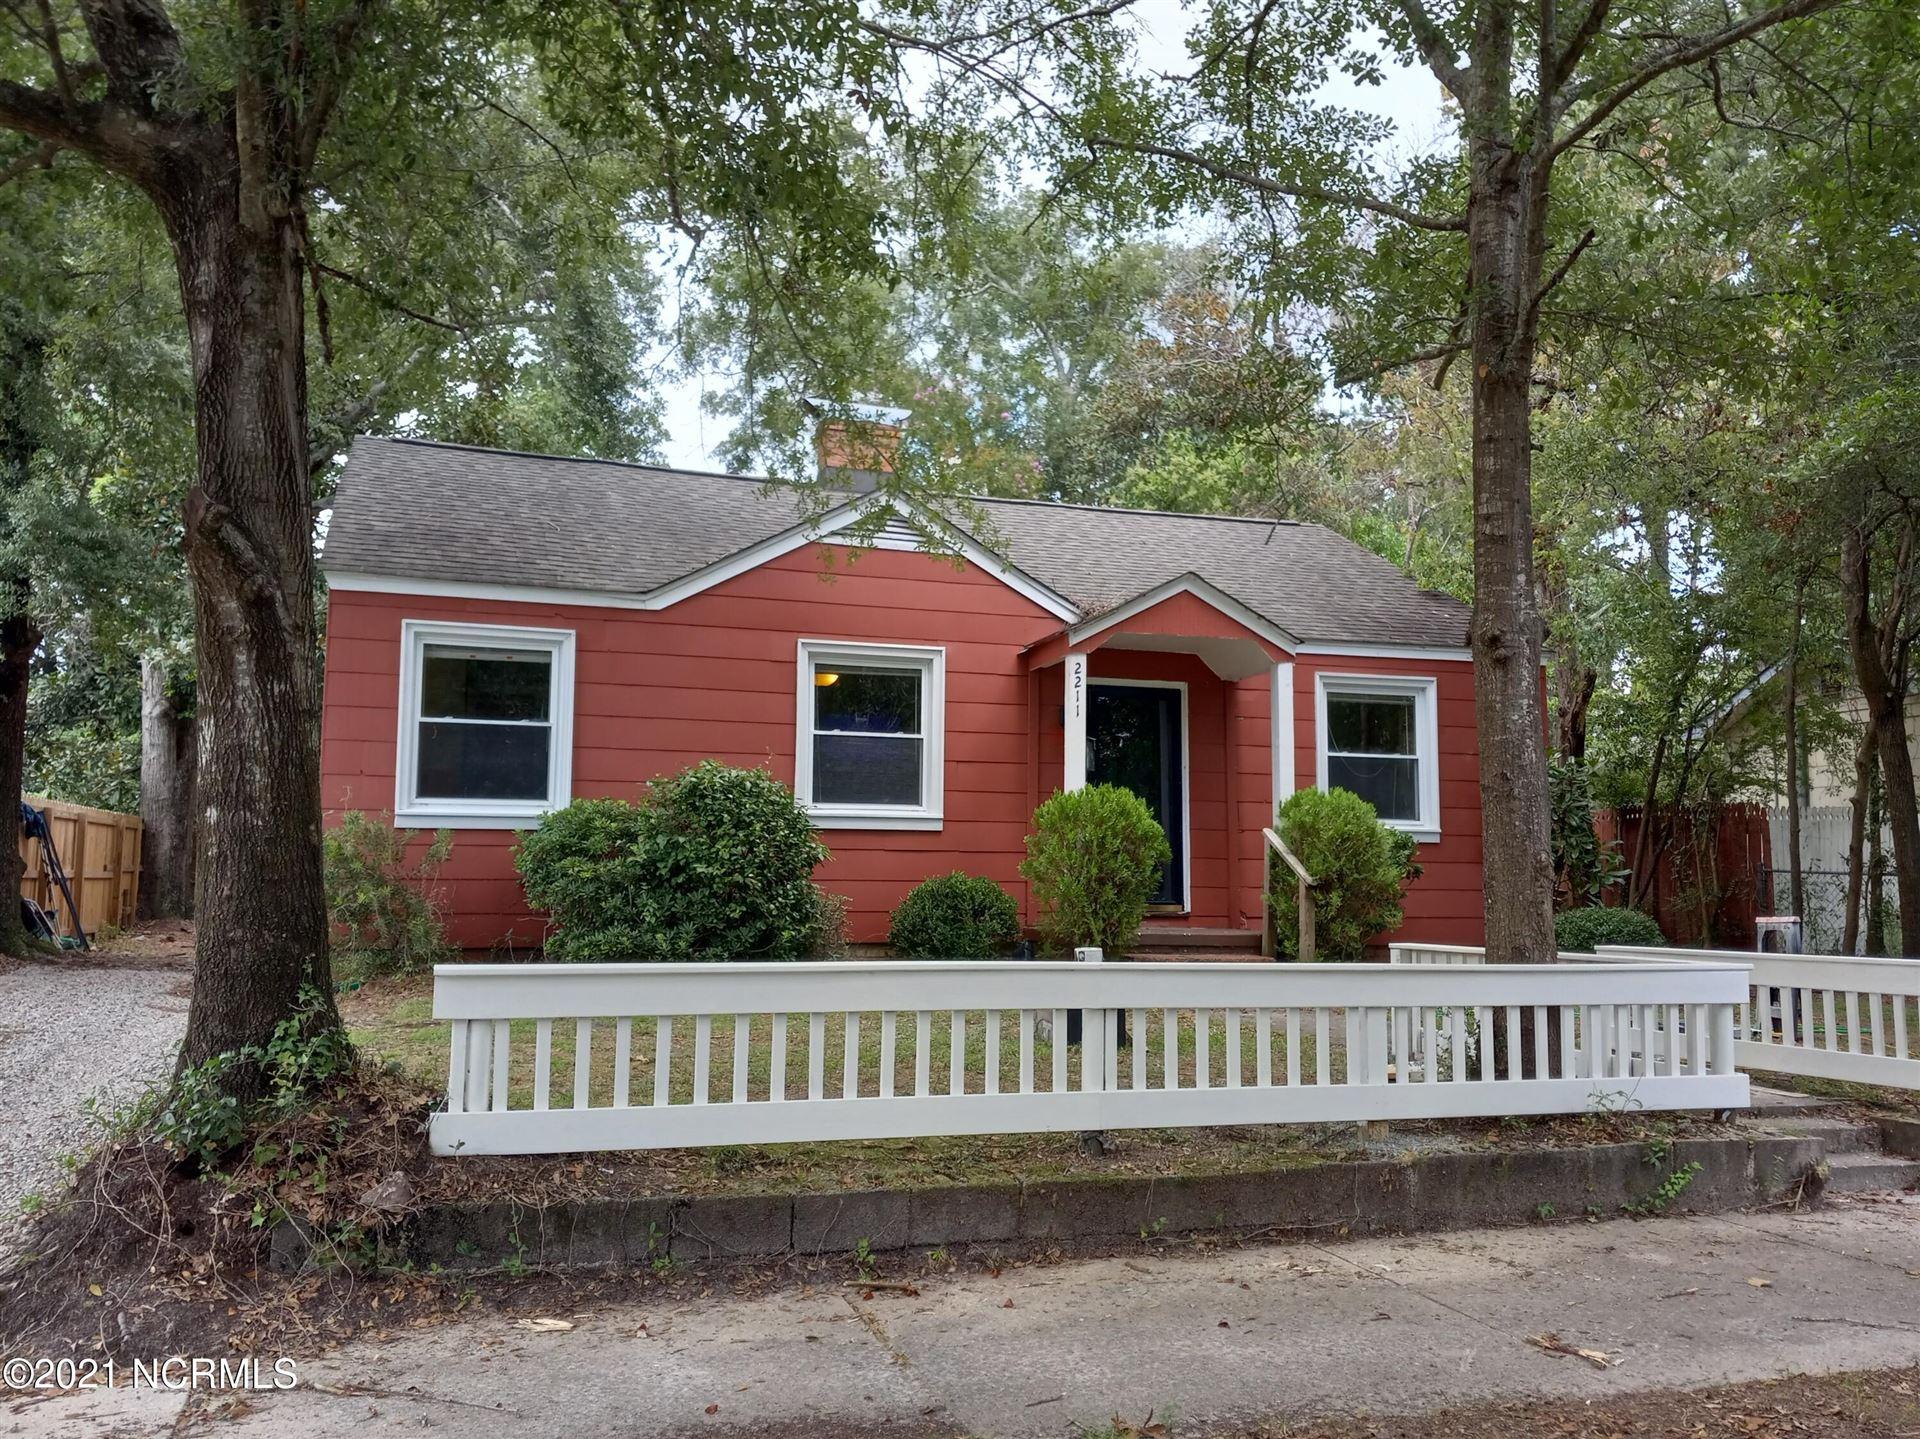 Photo of 2211 Klein Road, Wilmington, NC 28405 (MLS # 100287254)